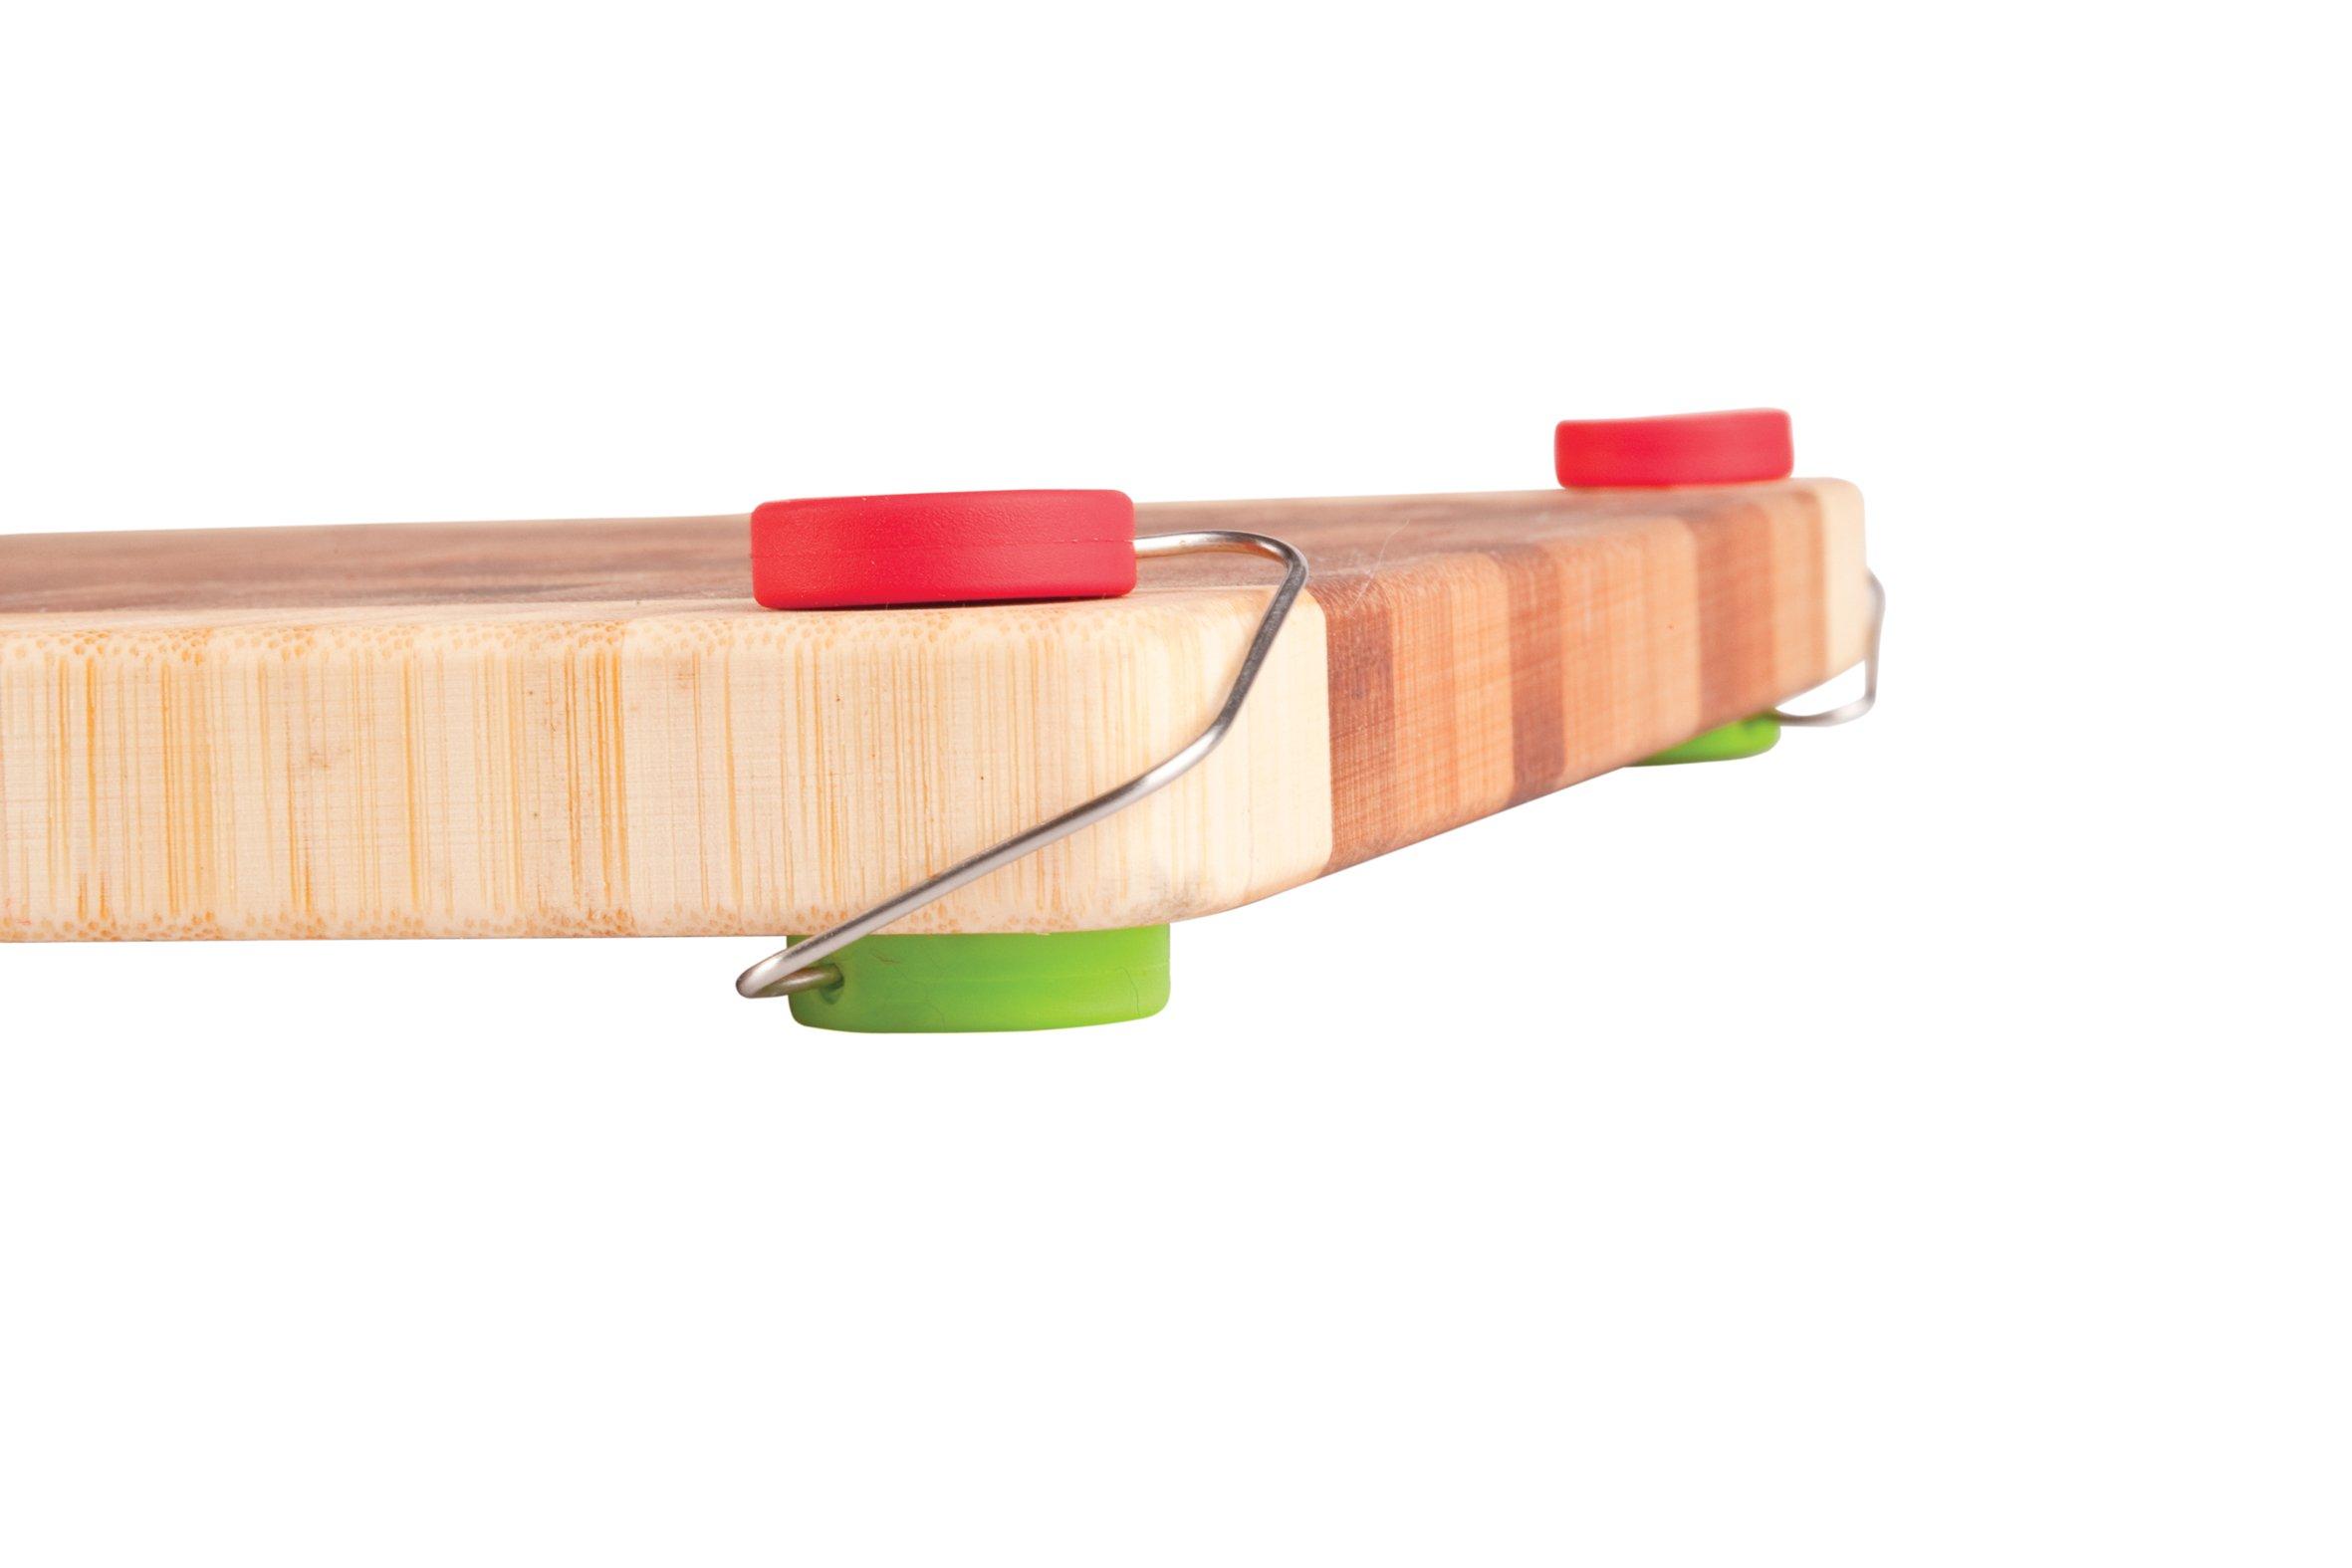 Dreamfarm Chobs - Non-Slip Silicone Cutting Board Feet, Set of 4 (Assorted Colors)